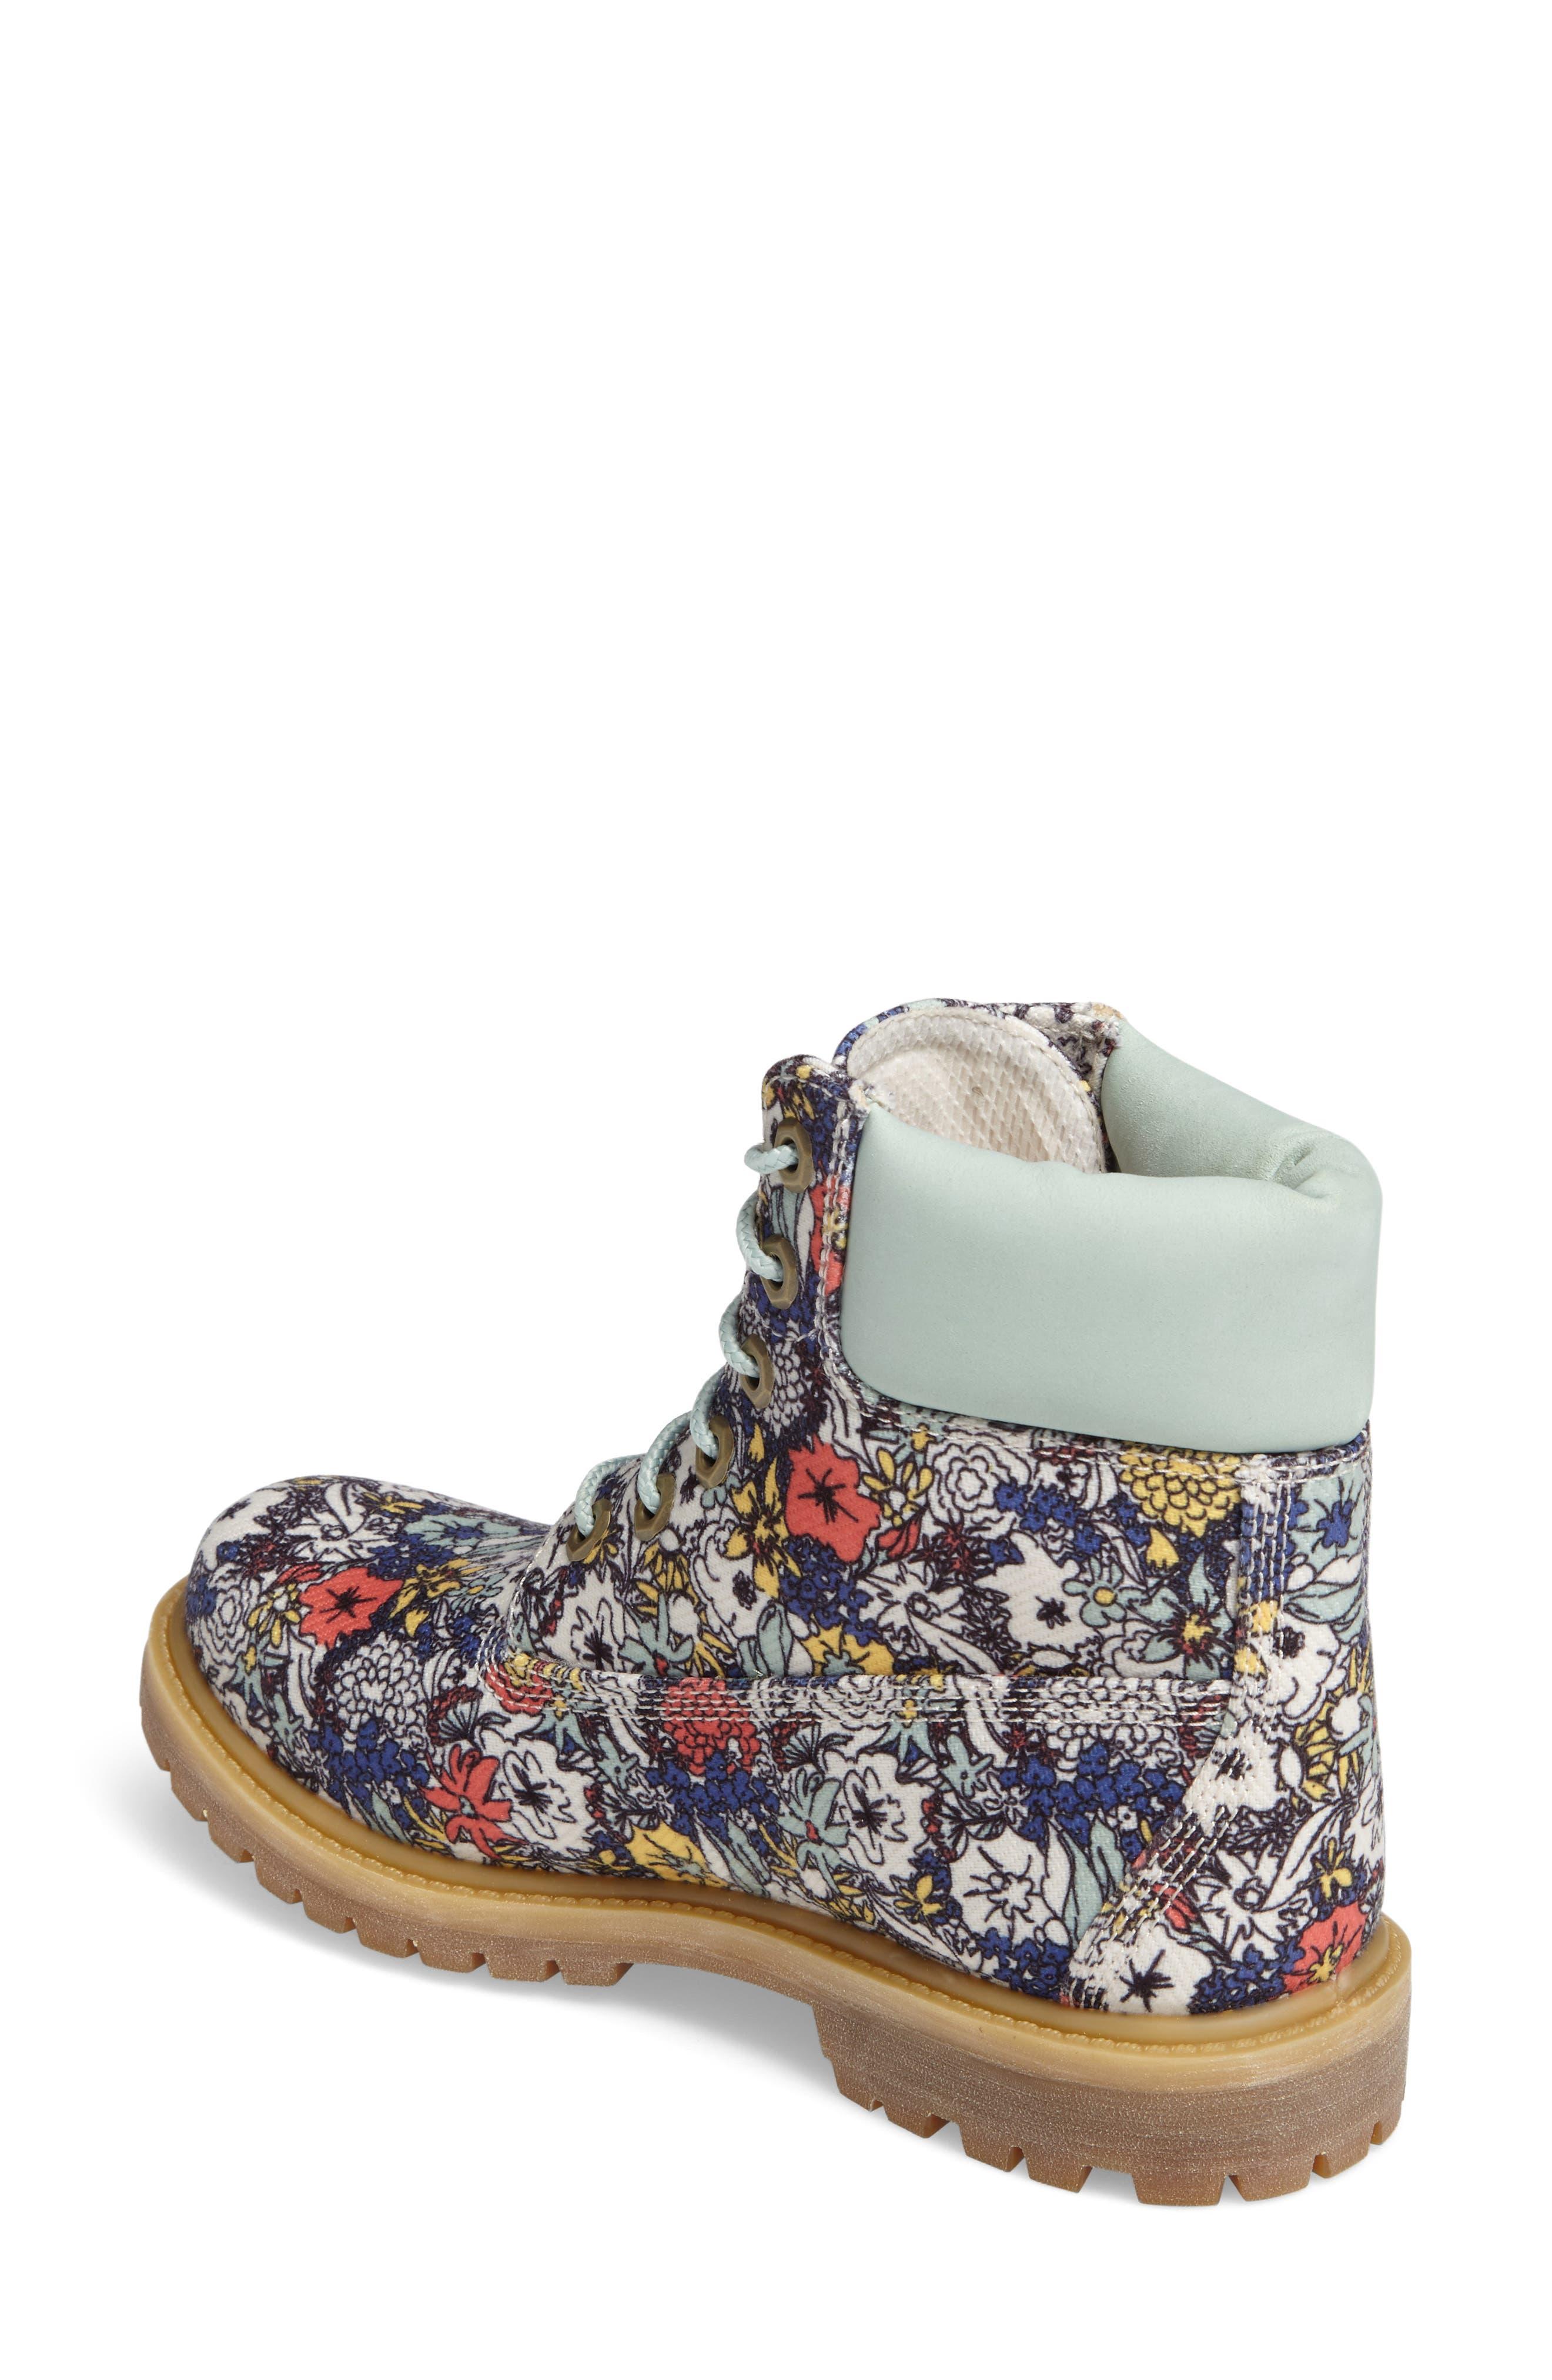 6 Inch Premium Floral Print Boot,                             Alternate thumbnail 2, color,                             400